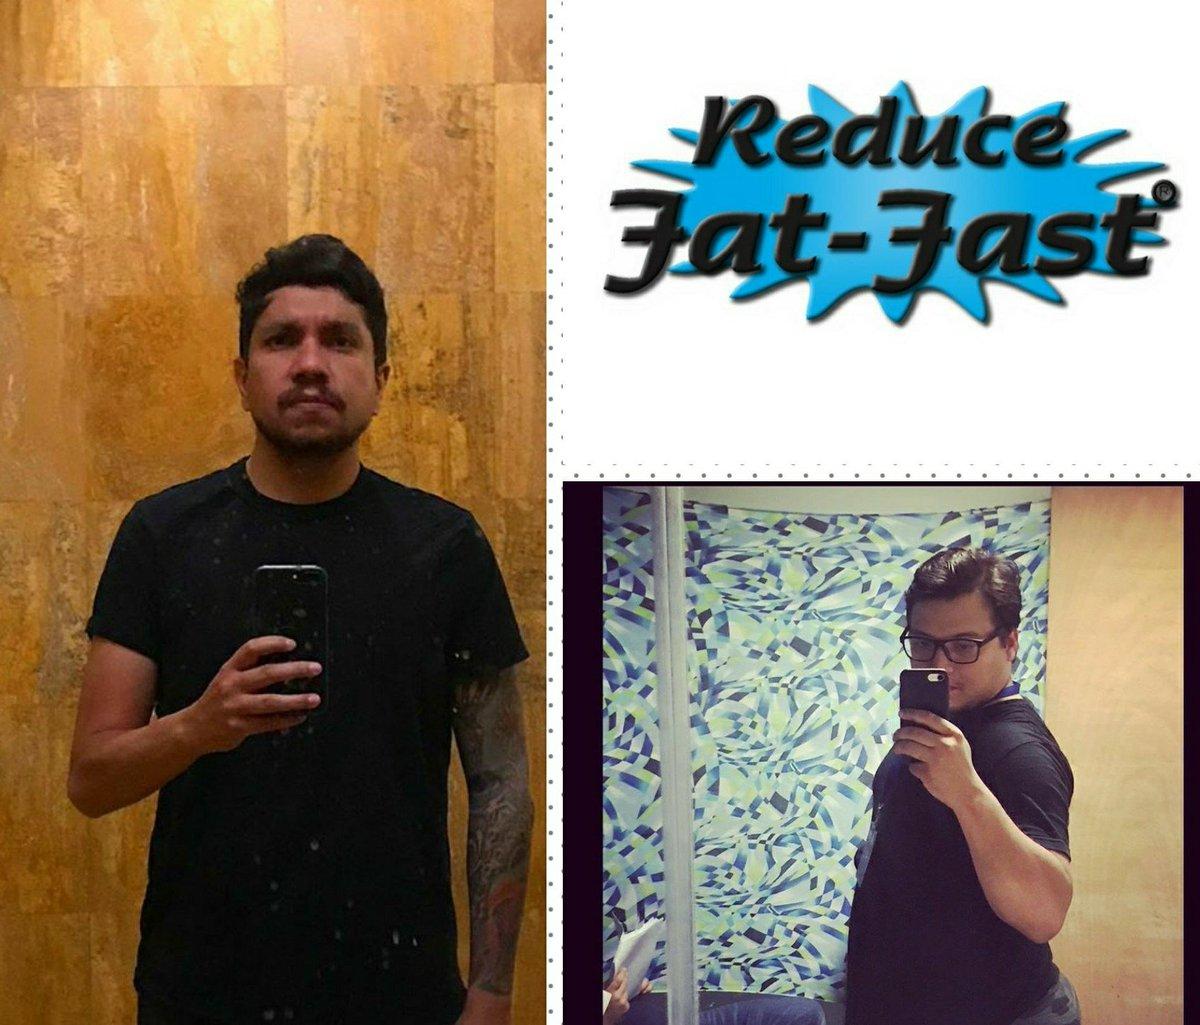 reduce fat fast sirve para adelgazar